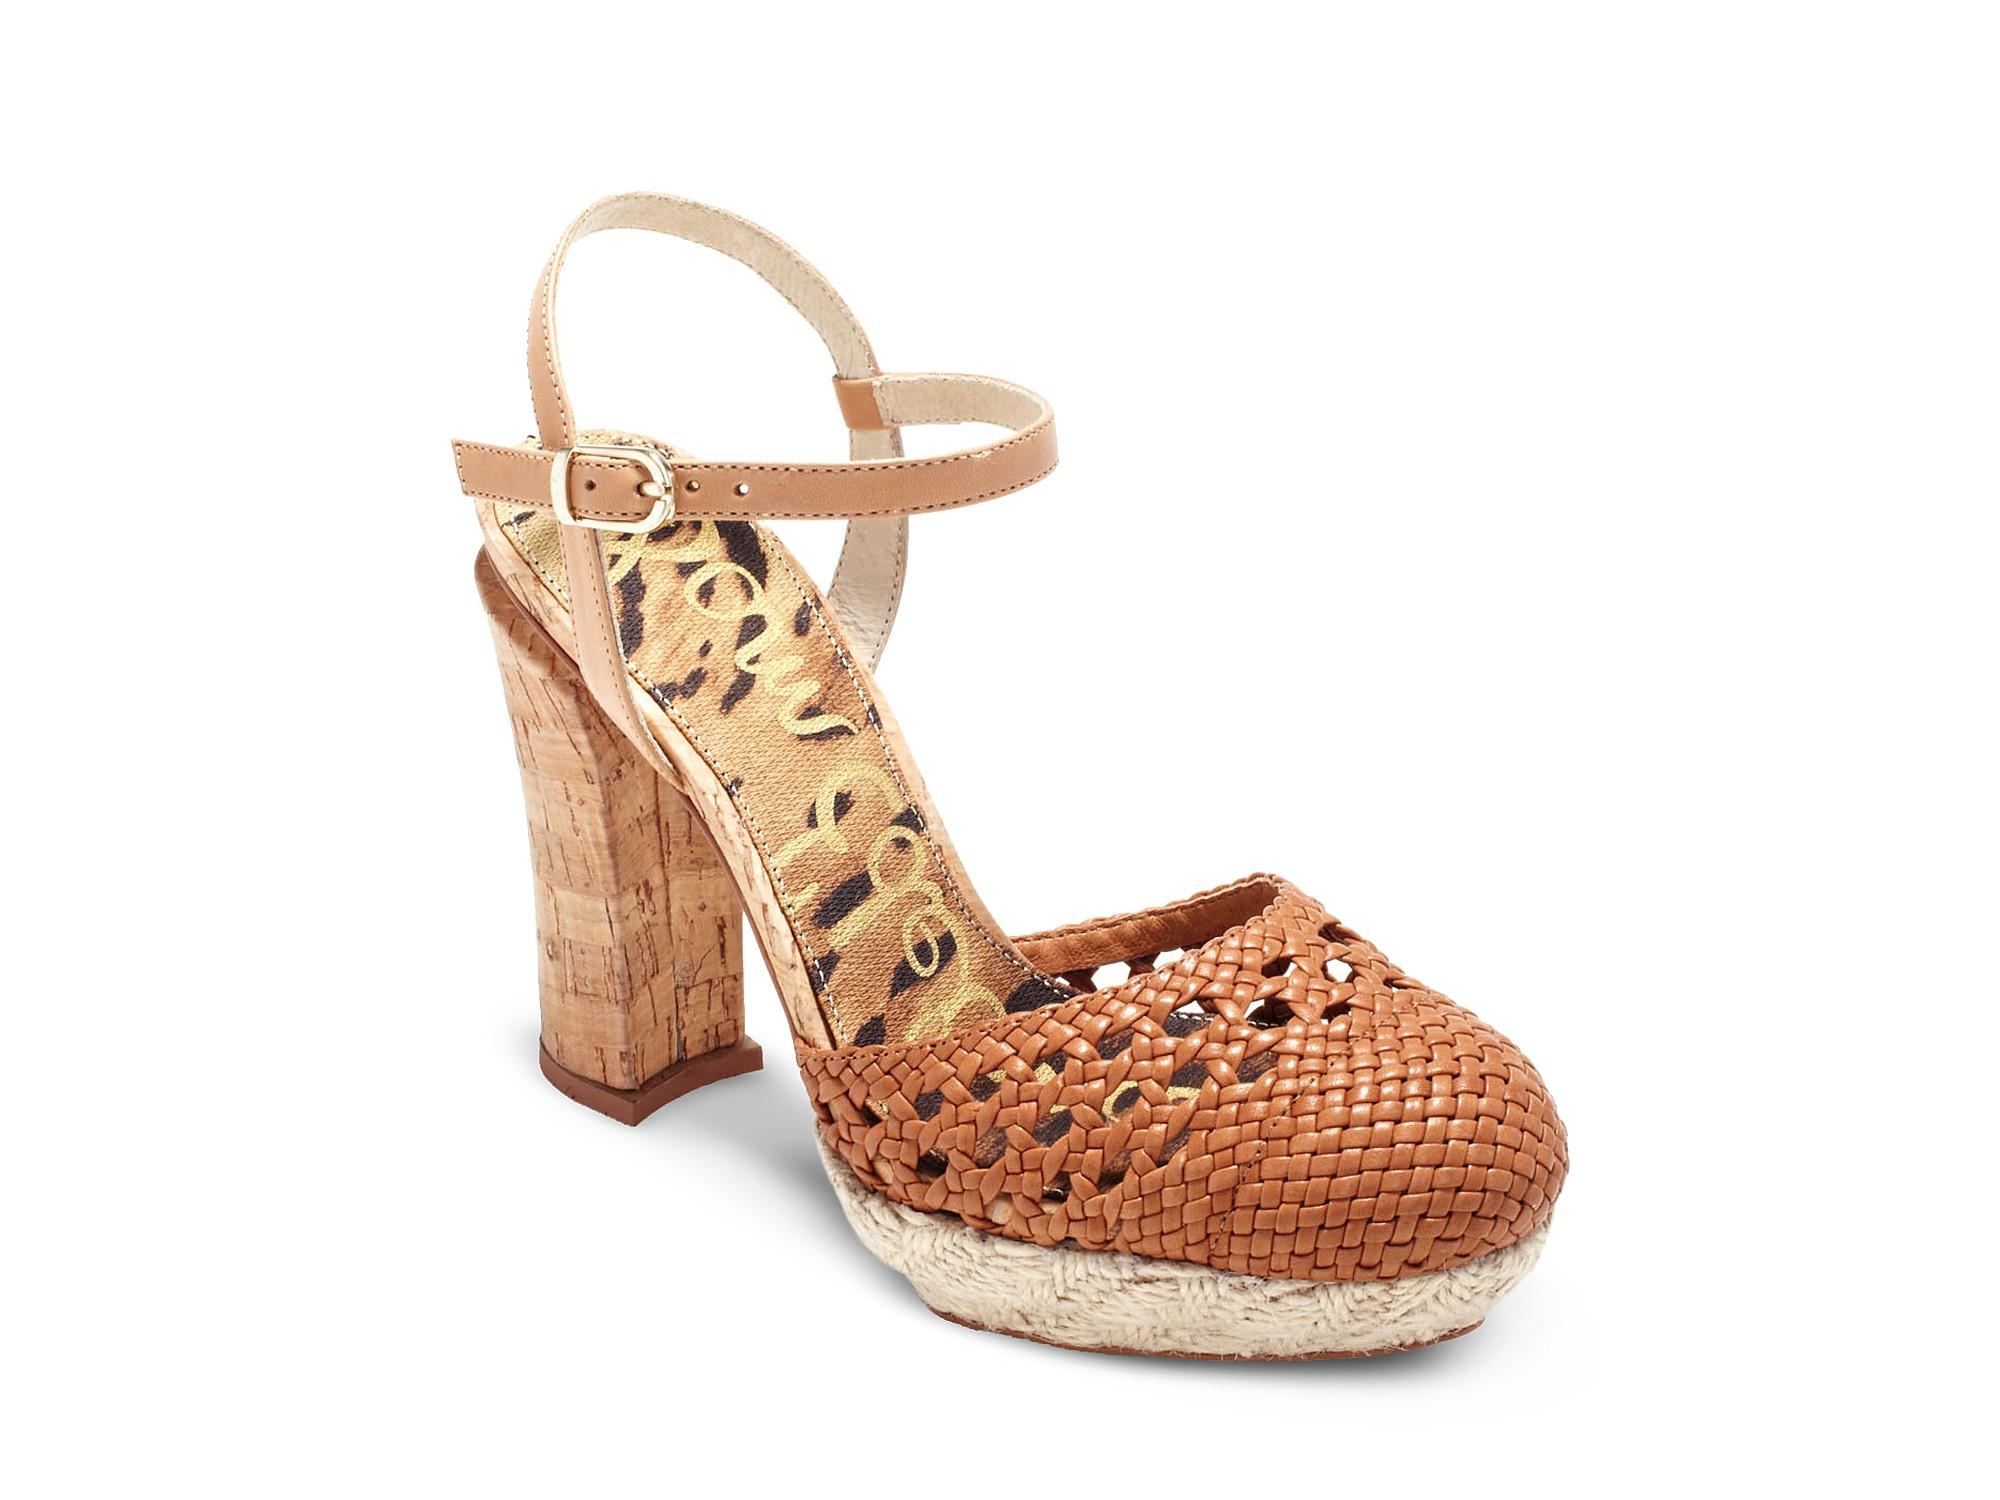 e29827a9a63 Lyst - Sam Edelman Rella Chunky Heel Closed Toe Sandals in Brown